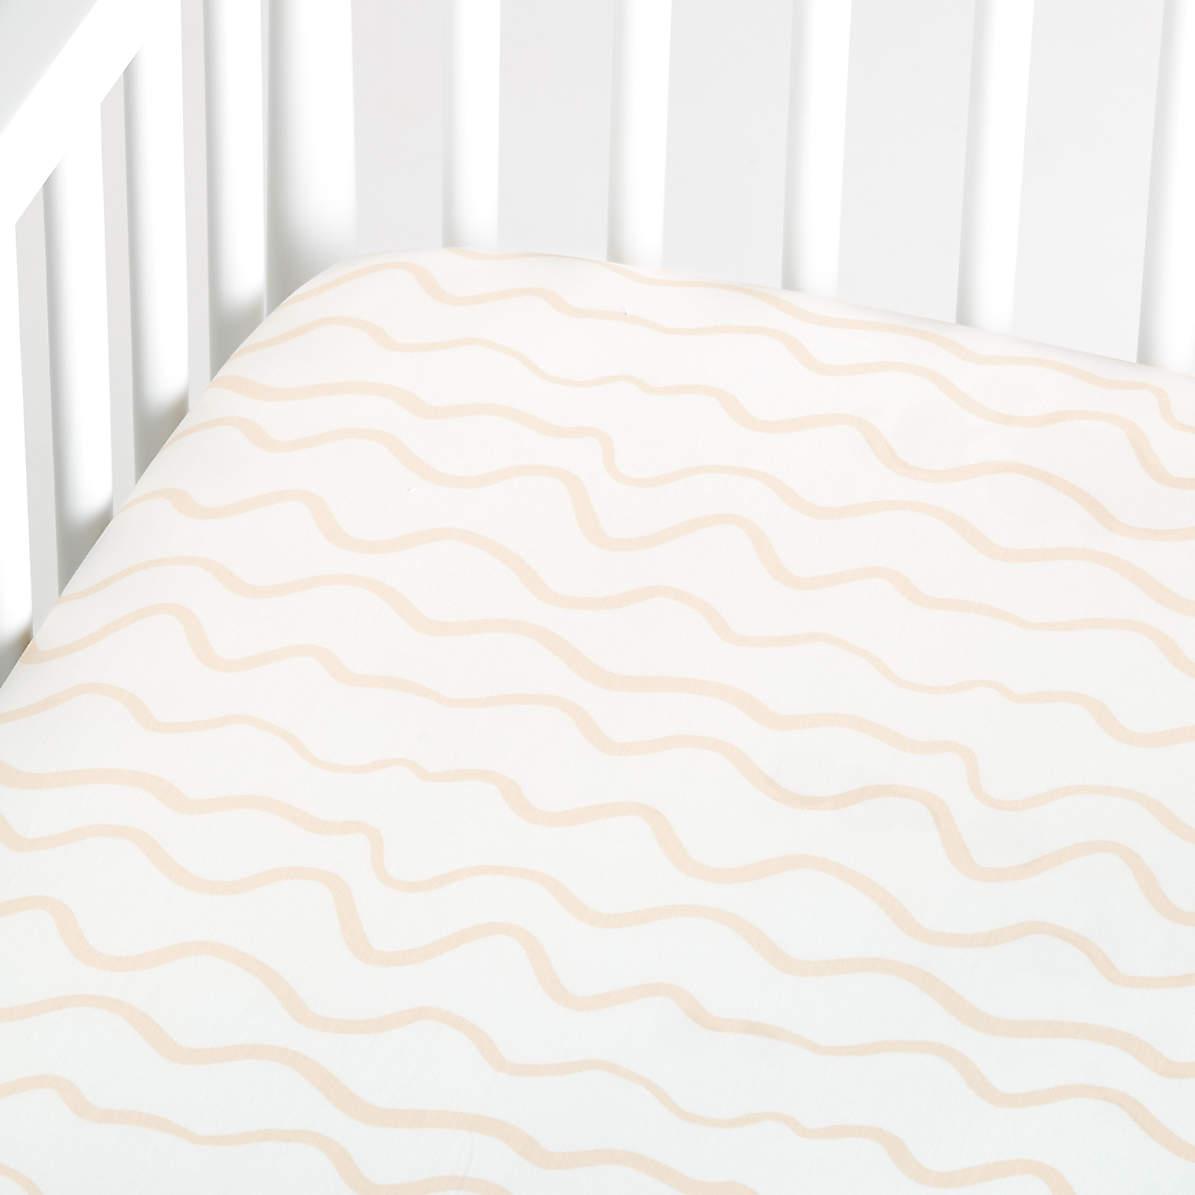 Name Reveal Black Crib Sheet Crib Sheets Organic Baby Crib Sheet Lightning Bolt Baby Shower Gift Fitted Crib Sheet Organic Crib Sheet